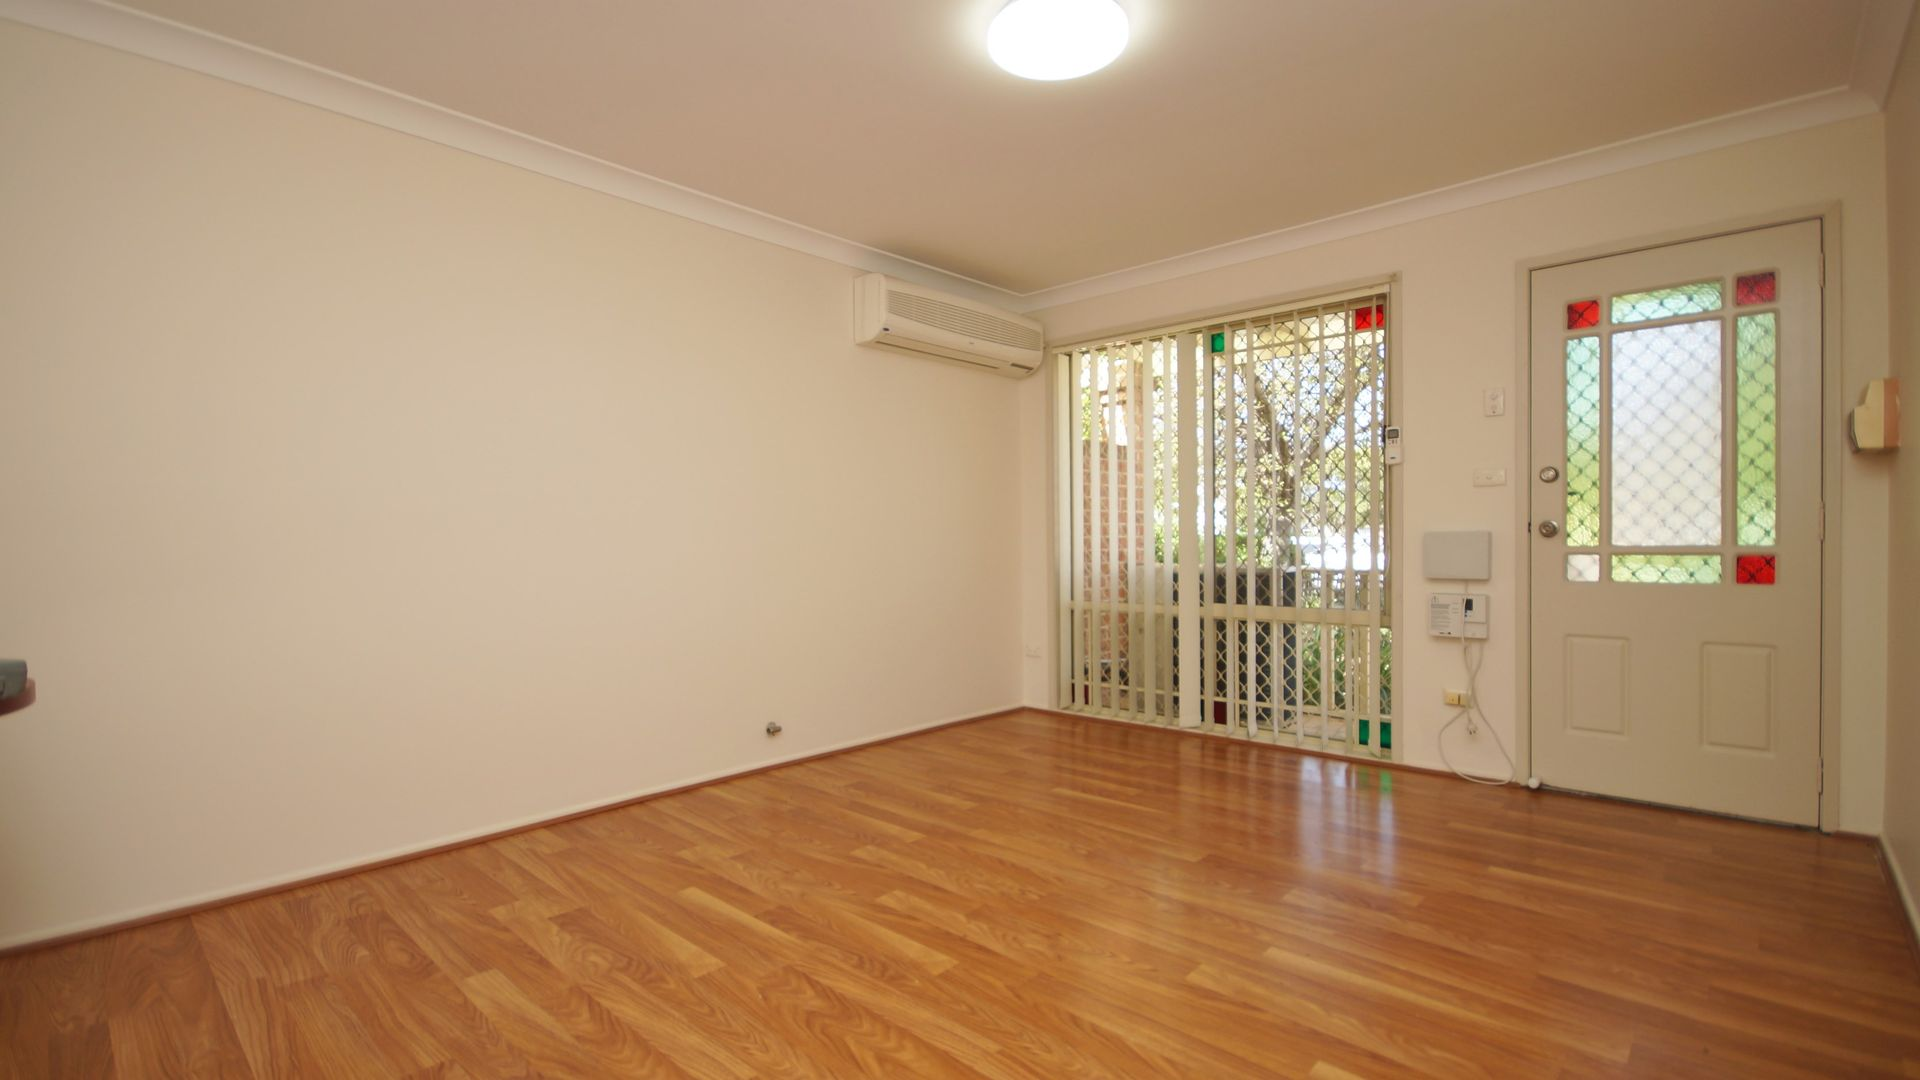 29/129-135 Frances Street, Lidcombe NSW 2141, Image 6